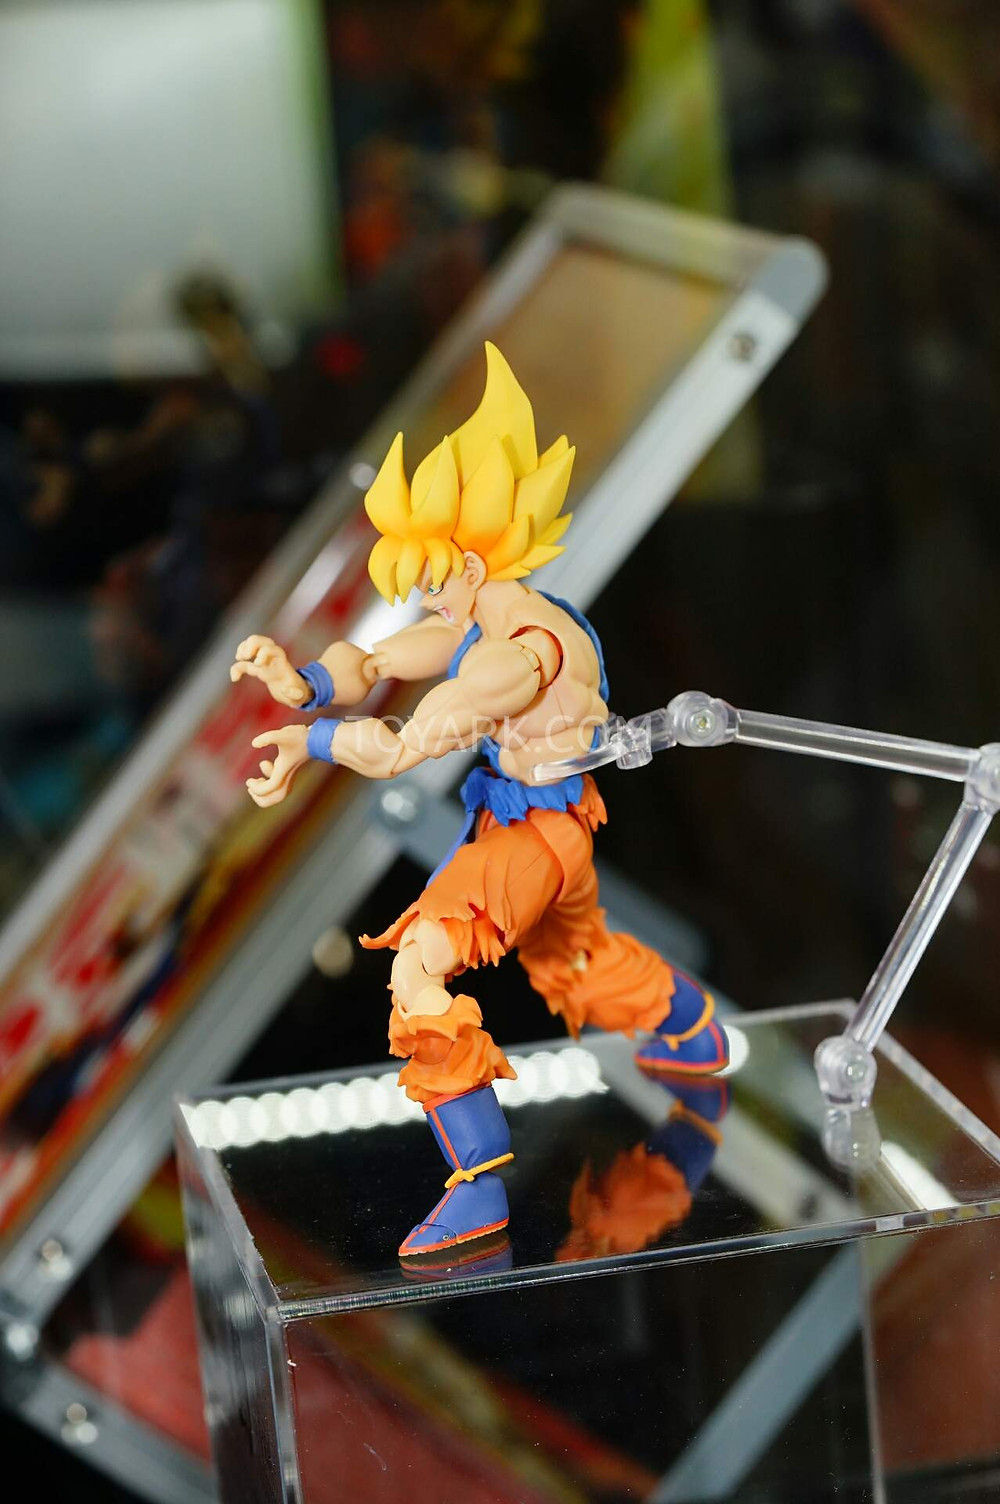 SDCC2015-Mattel-Tamashii-DBZ-031.jpg